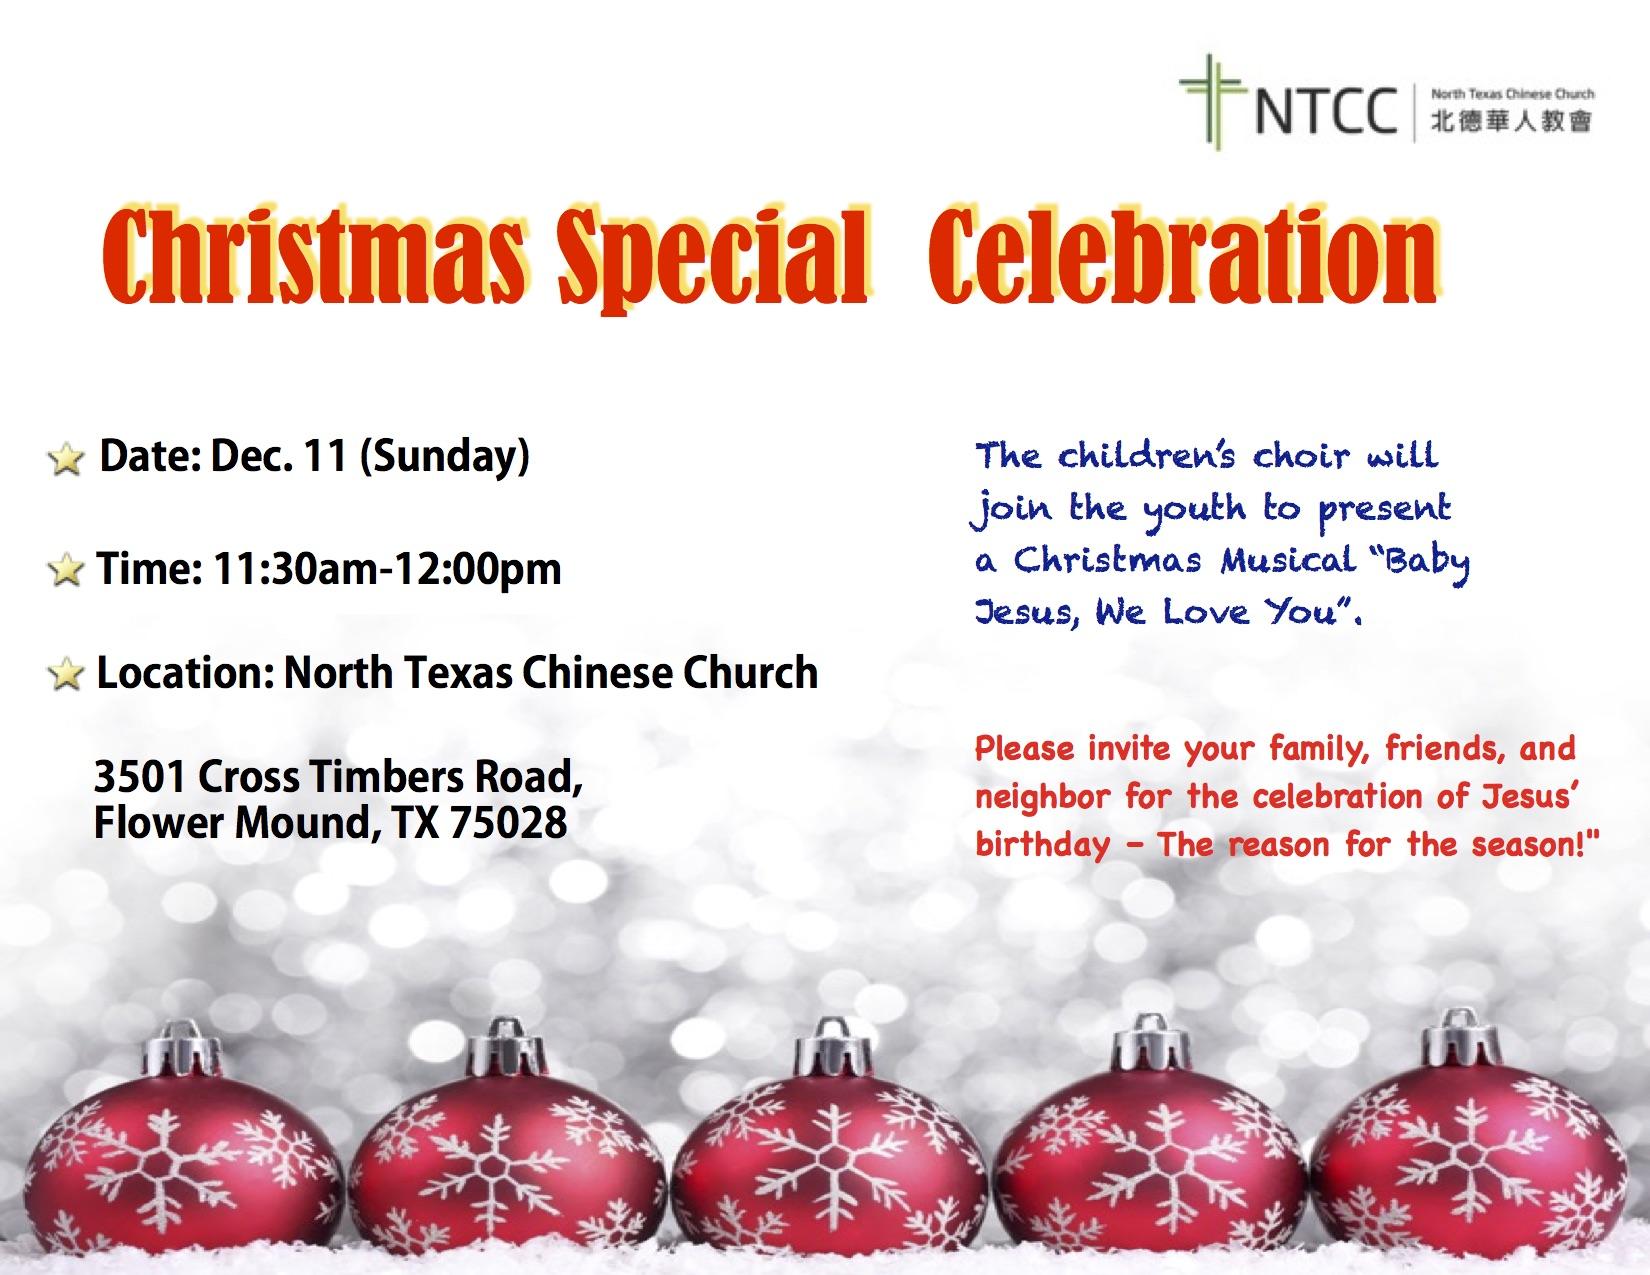 2016-ntcc-christmas-special